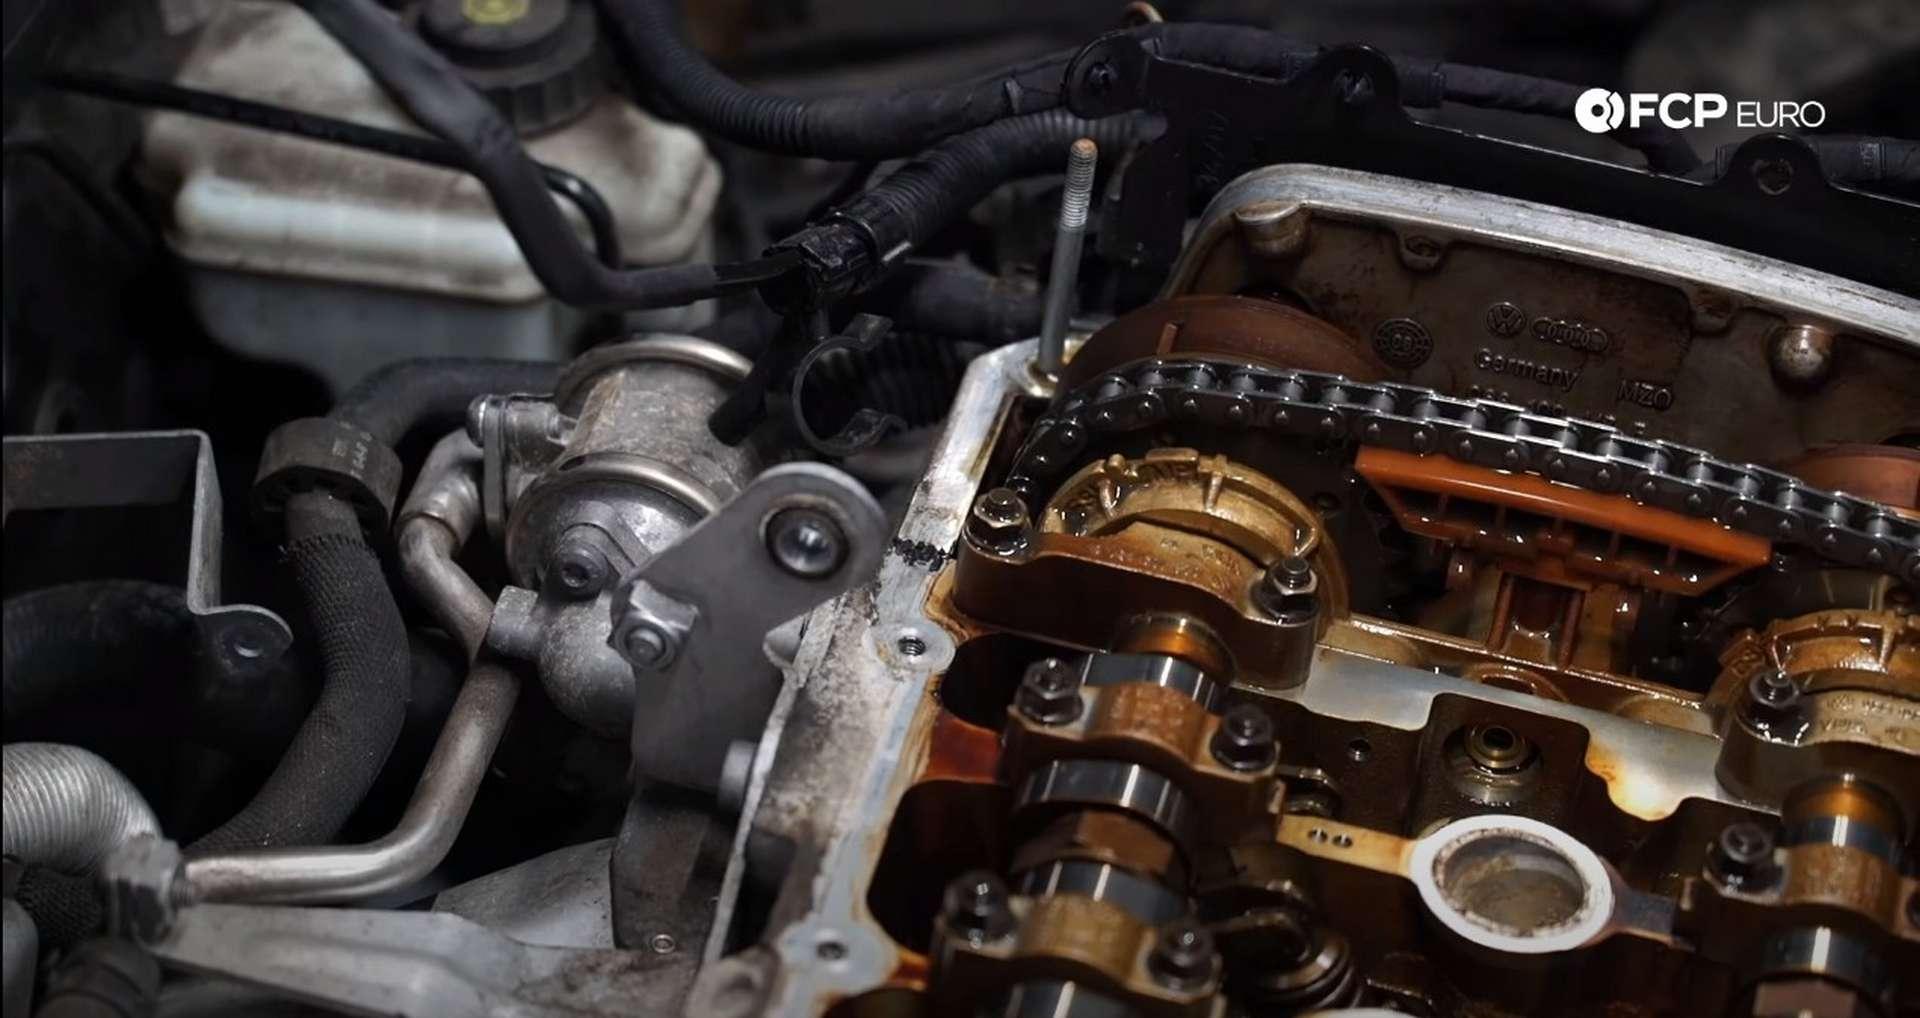 47-DIY-VW-VR6-Valve-Cover-Gasket-Replacing-Gasket